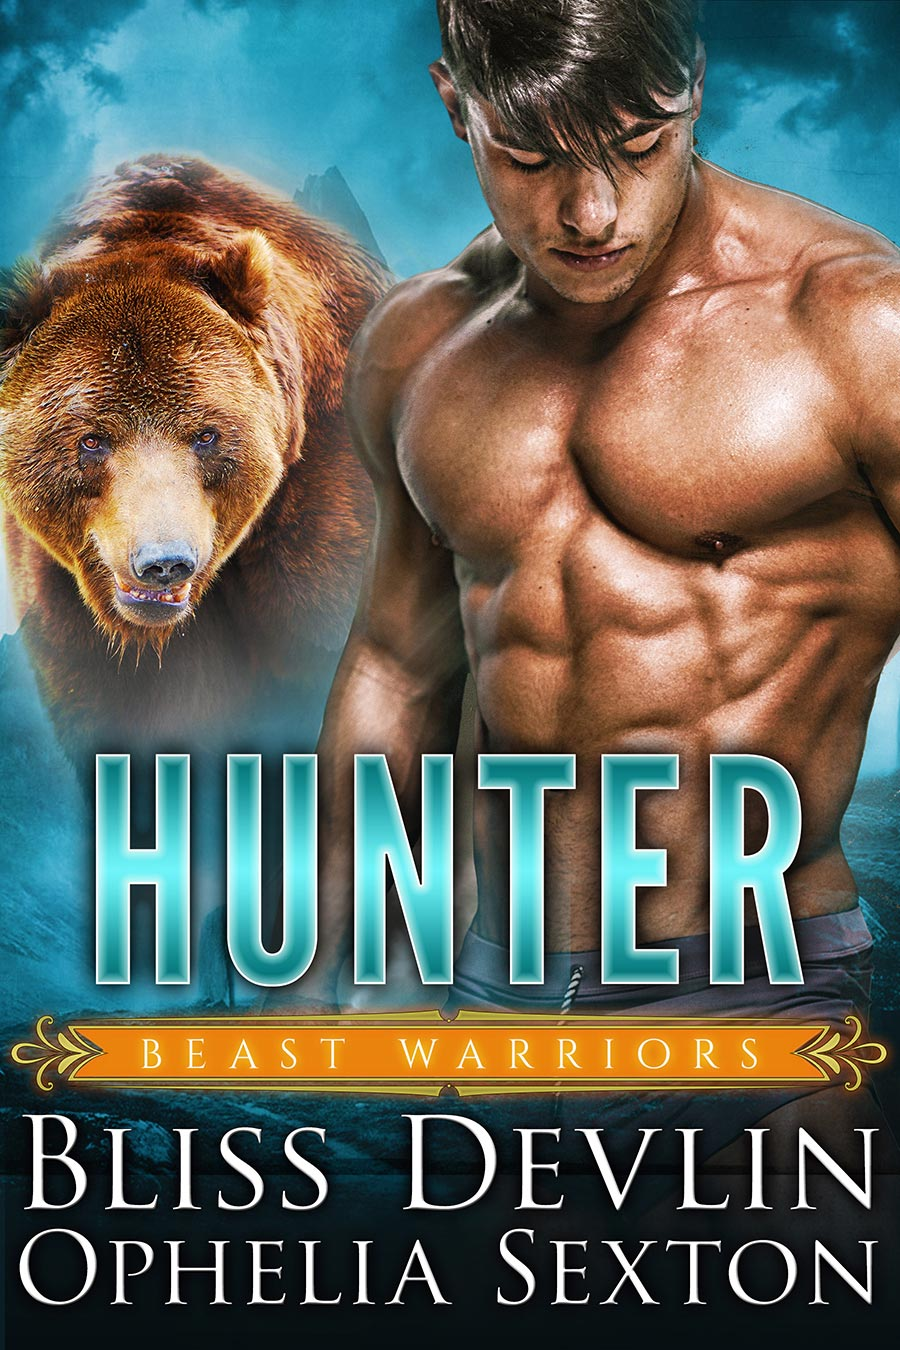 Hunter-by-Bliss-Devlin.jpg